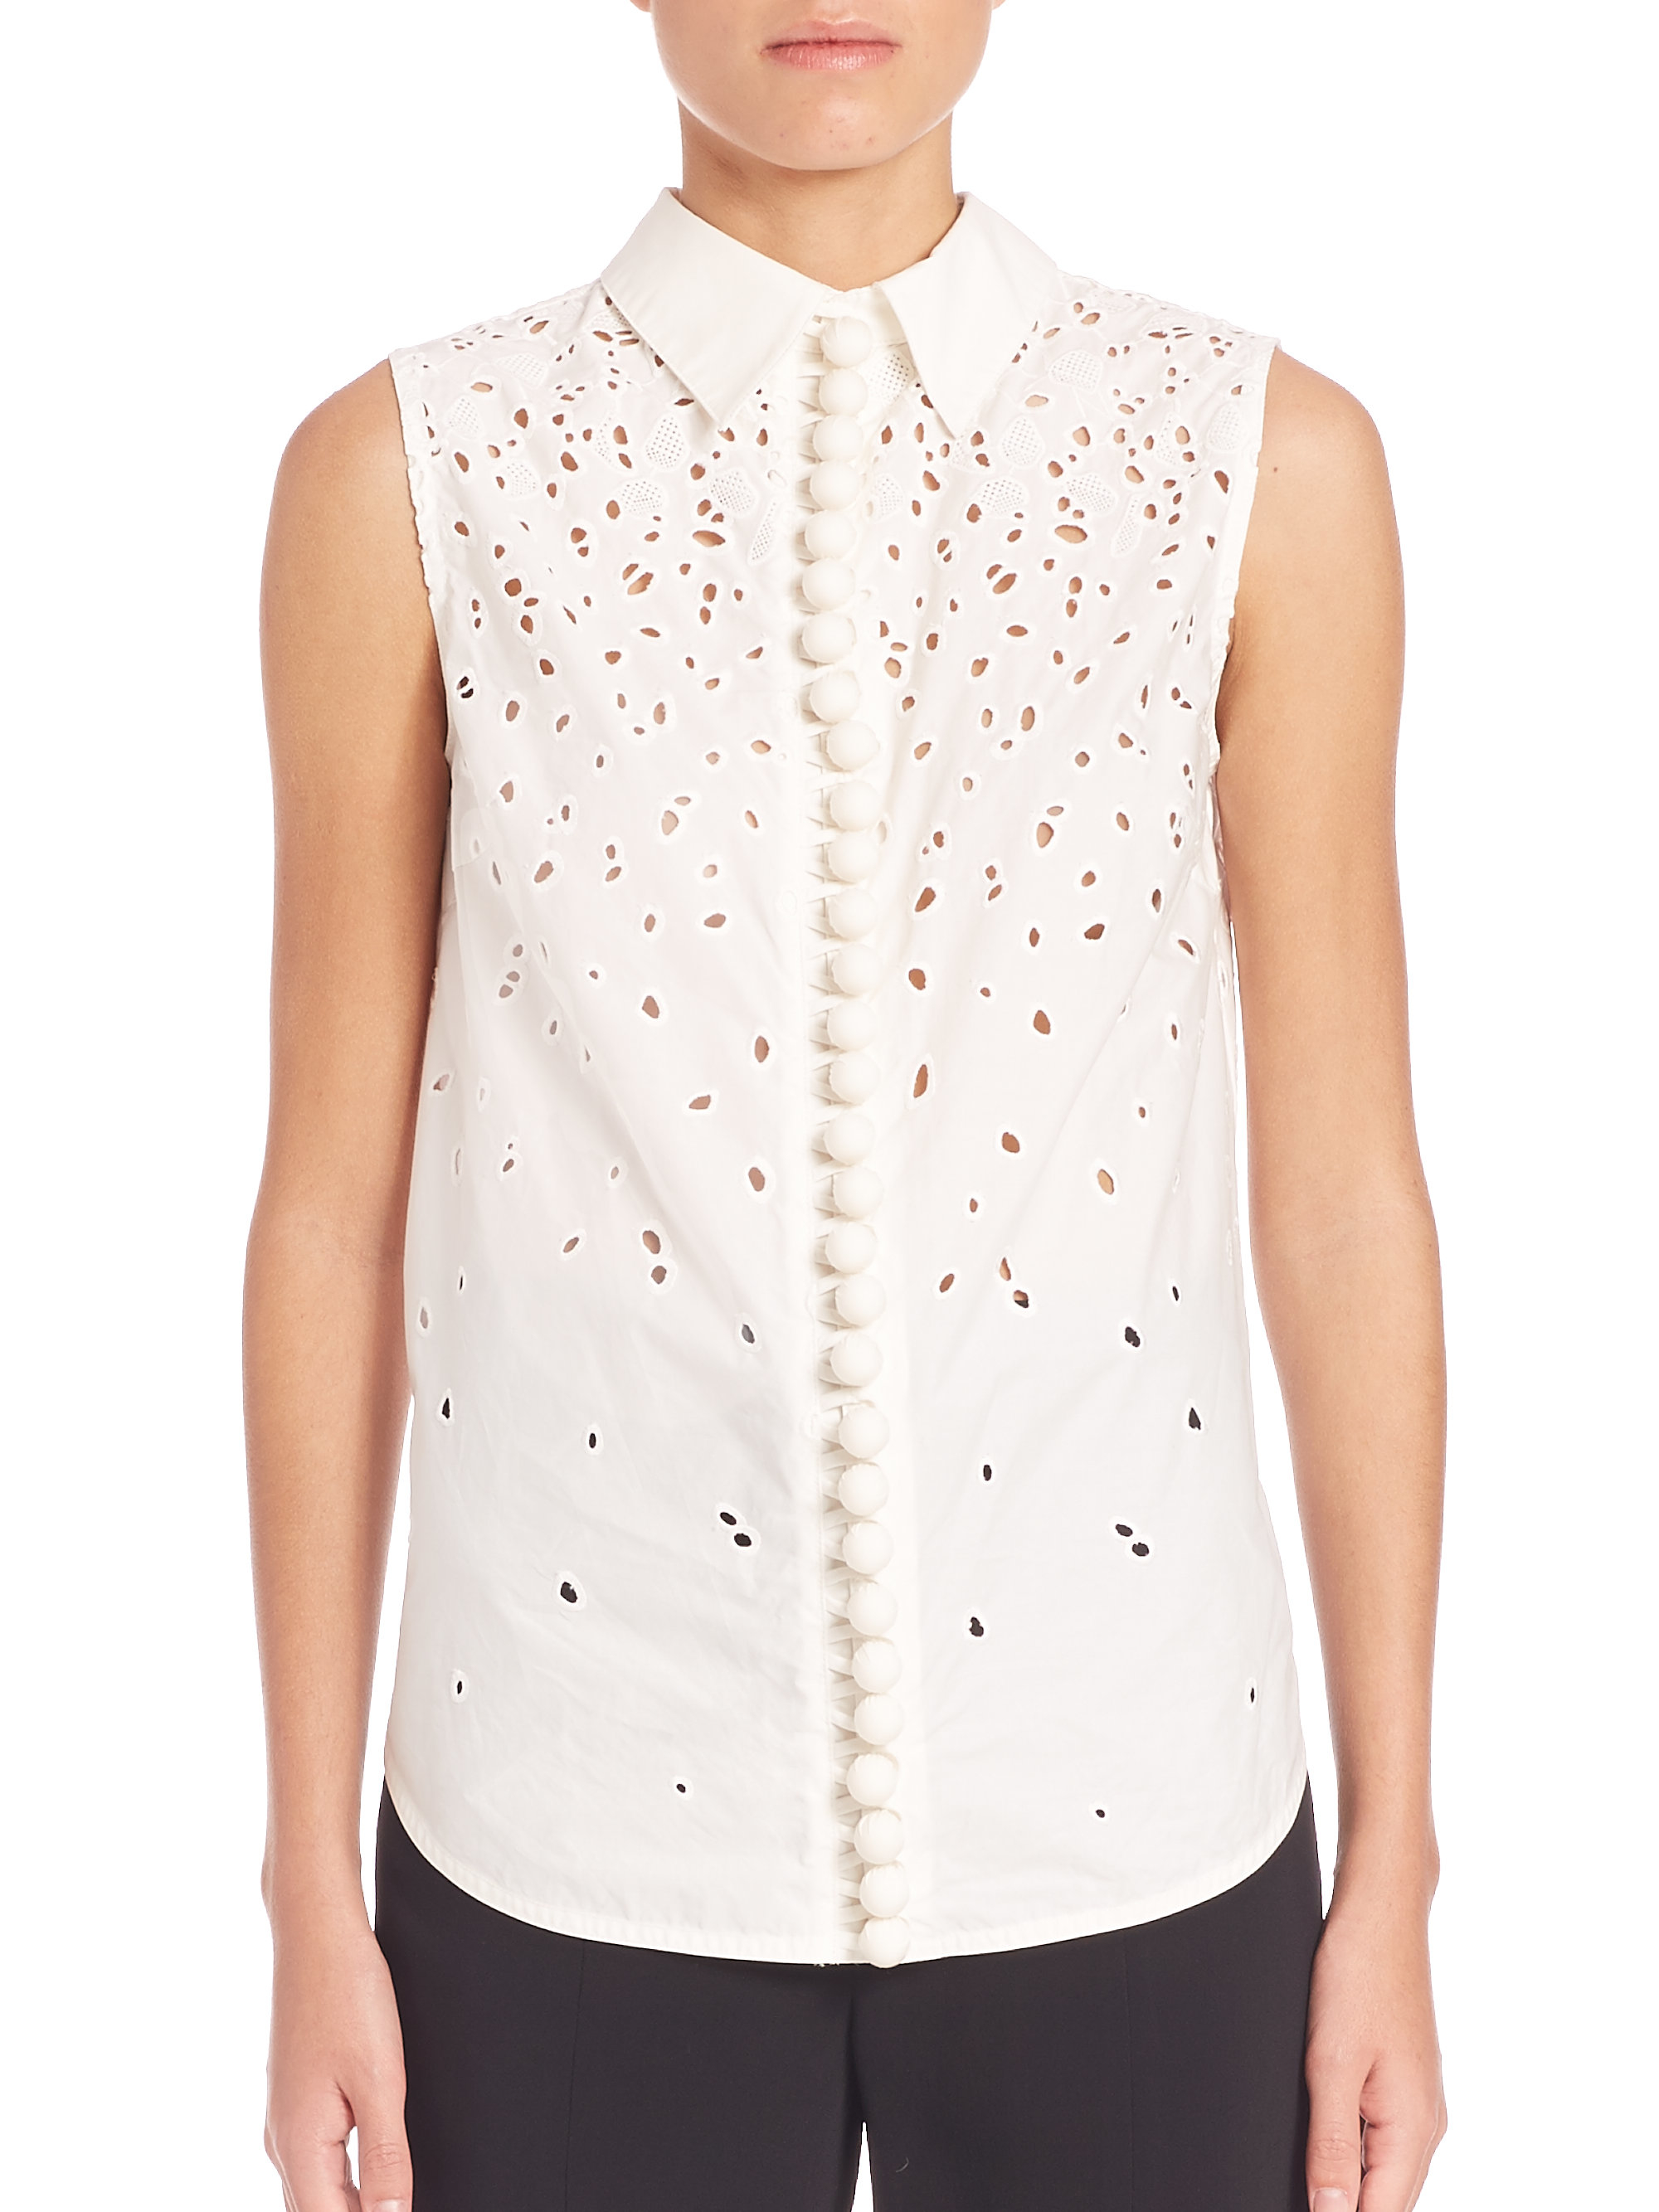 Cheap Sale 2018 Newest Proenza Schouler Woman Fil Coupé Cotton And Silk-blend Top White Size 0 Proenza Schouler Buy Cheap Order Under Sale Online y1yWZOnKT